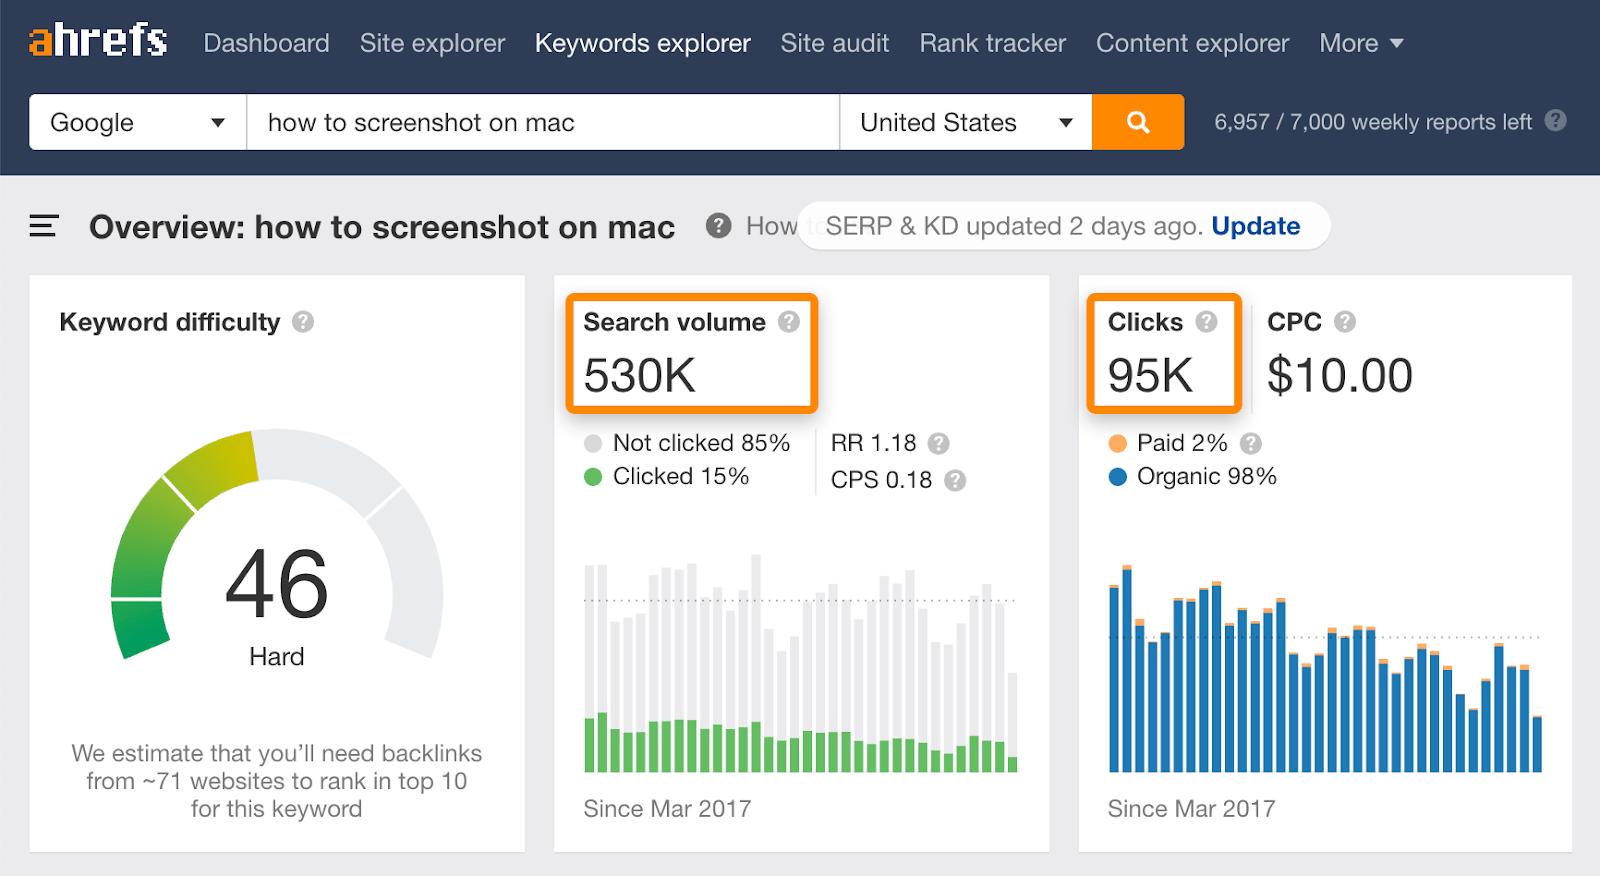 22 how to screenshot on mac clicks